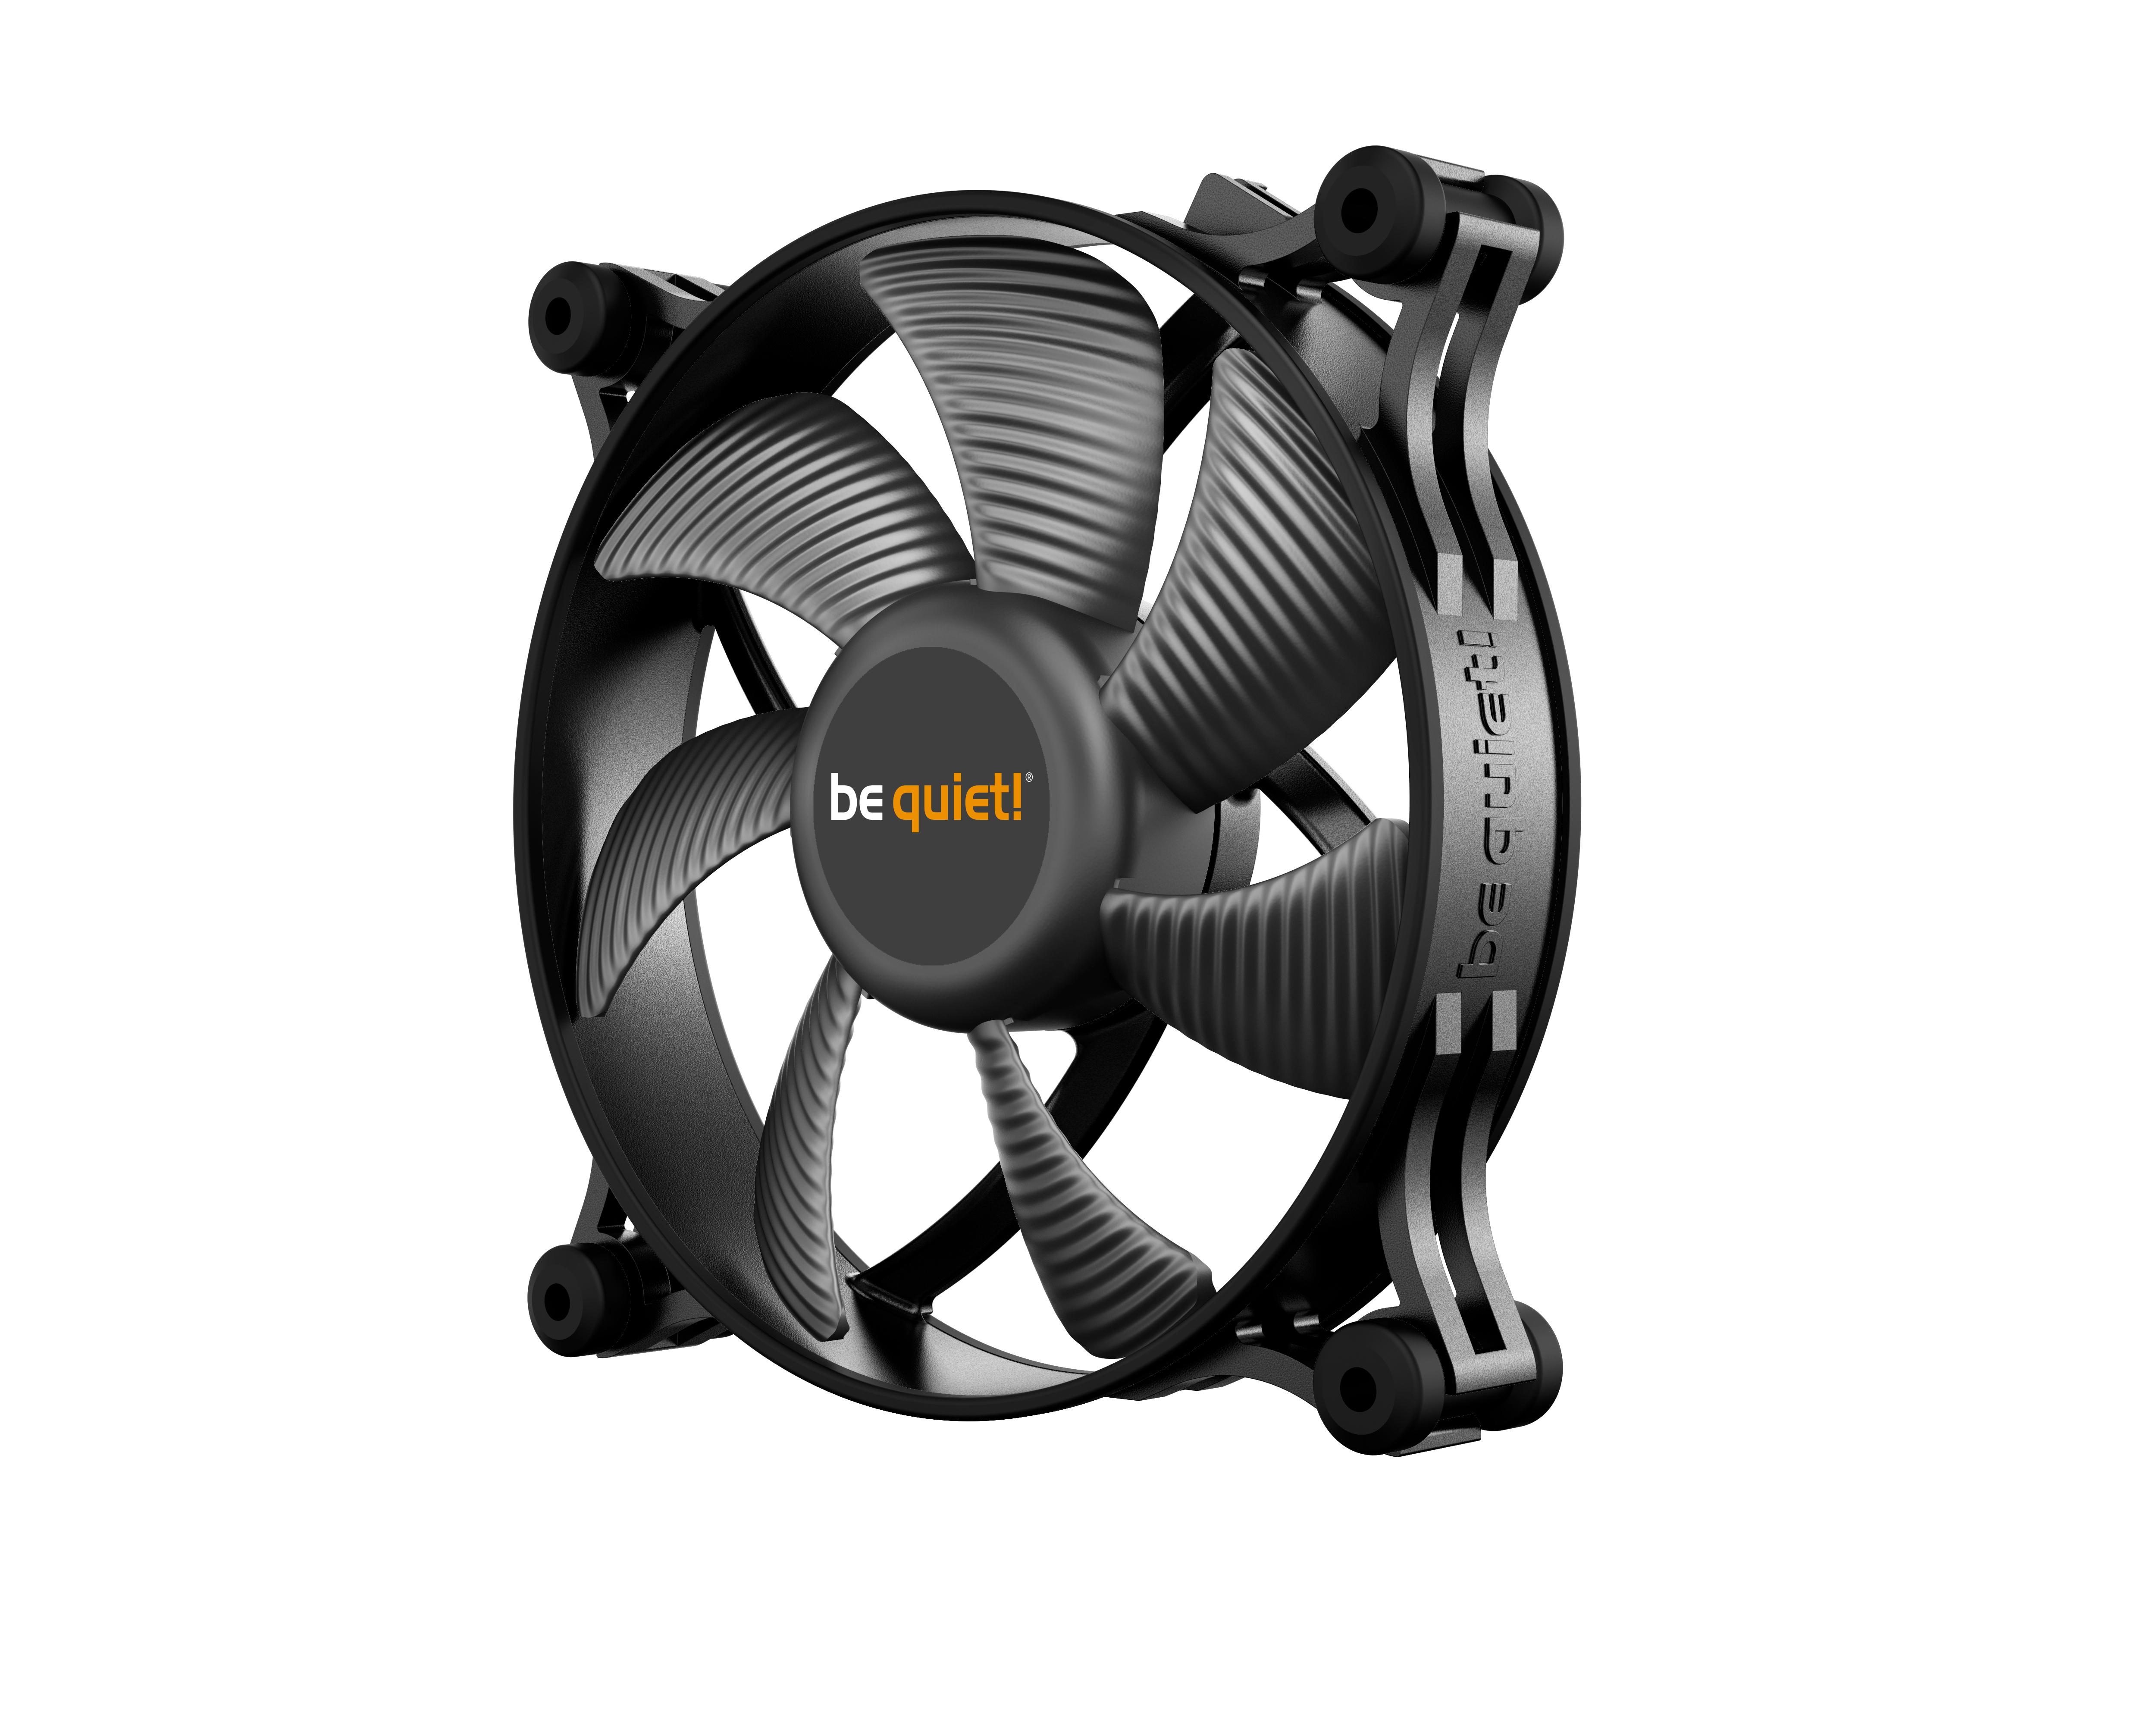 be quiet! Shadow Wings 2 120mm PWM, 120x120x25, 1100 rpm, 15,9 dB, 38,5 cfm, 4 pin